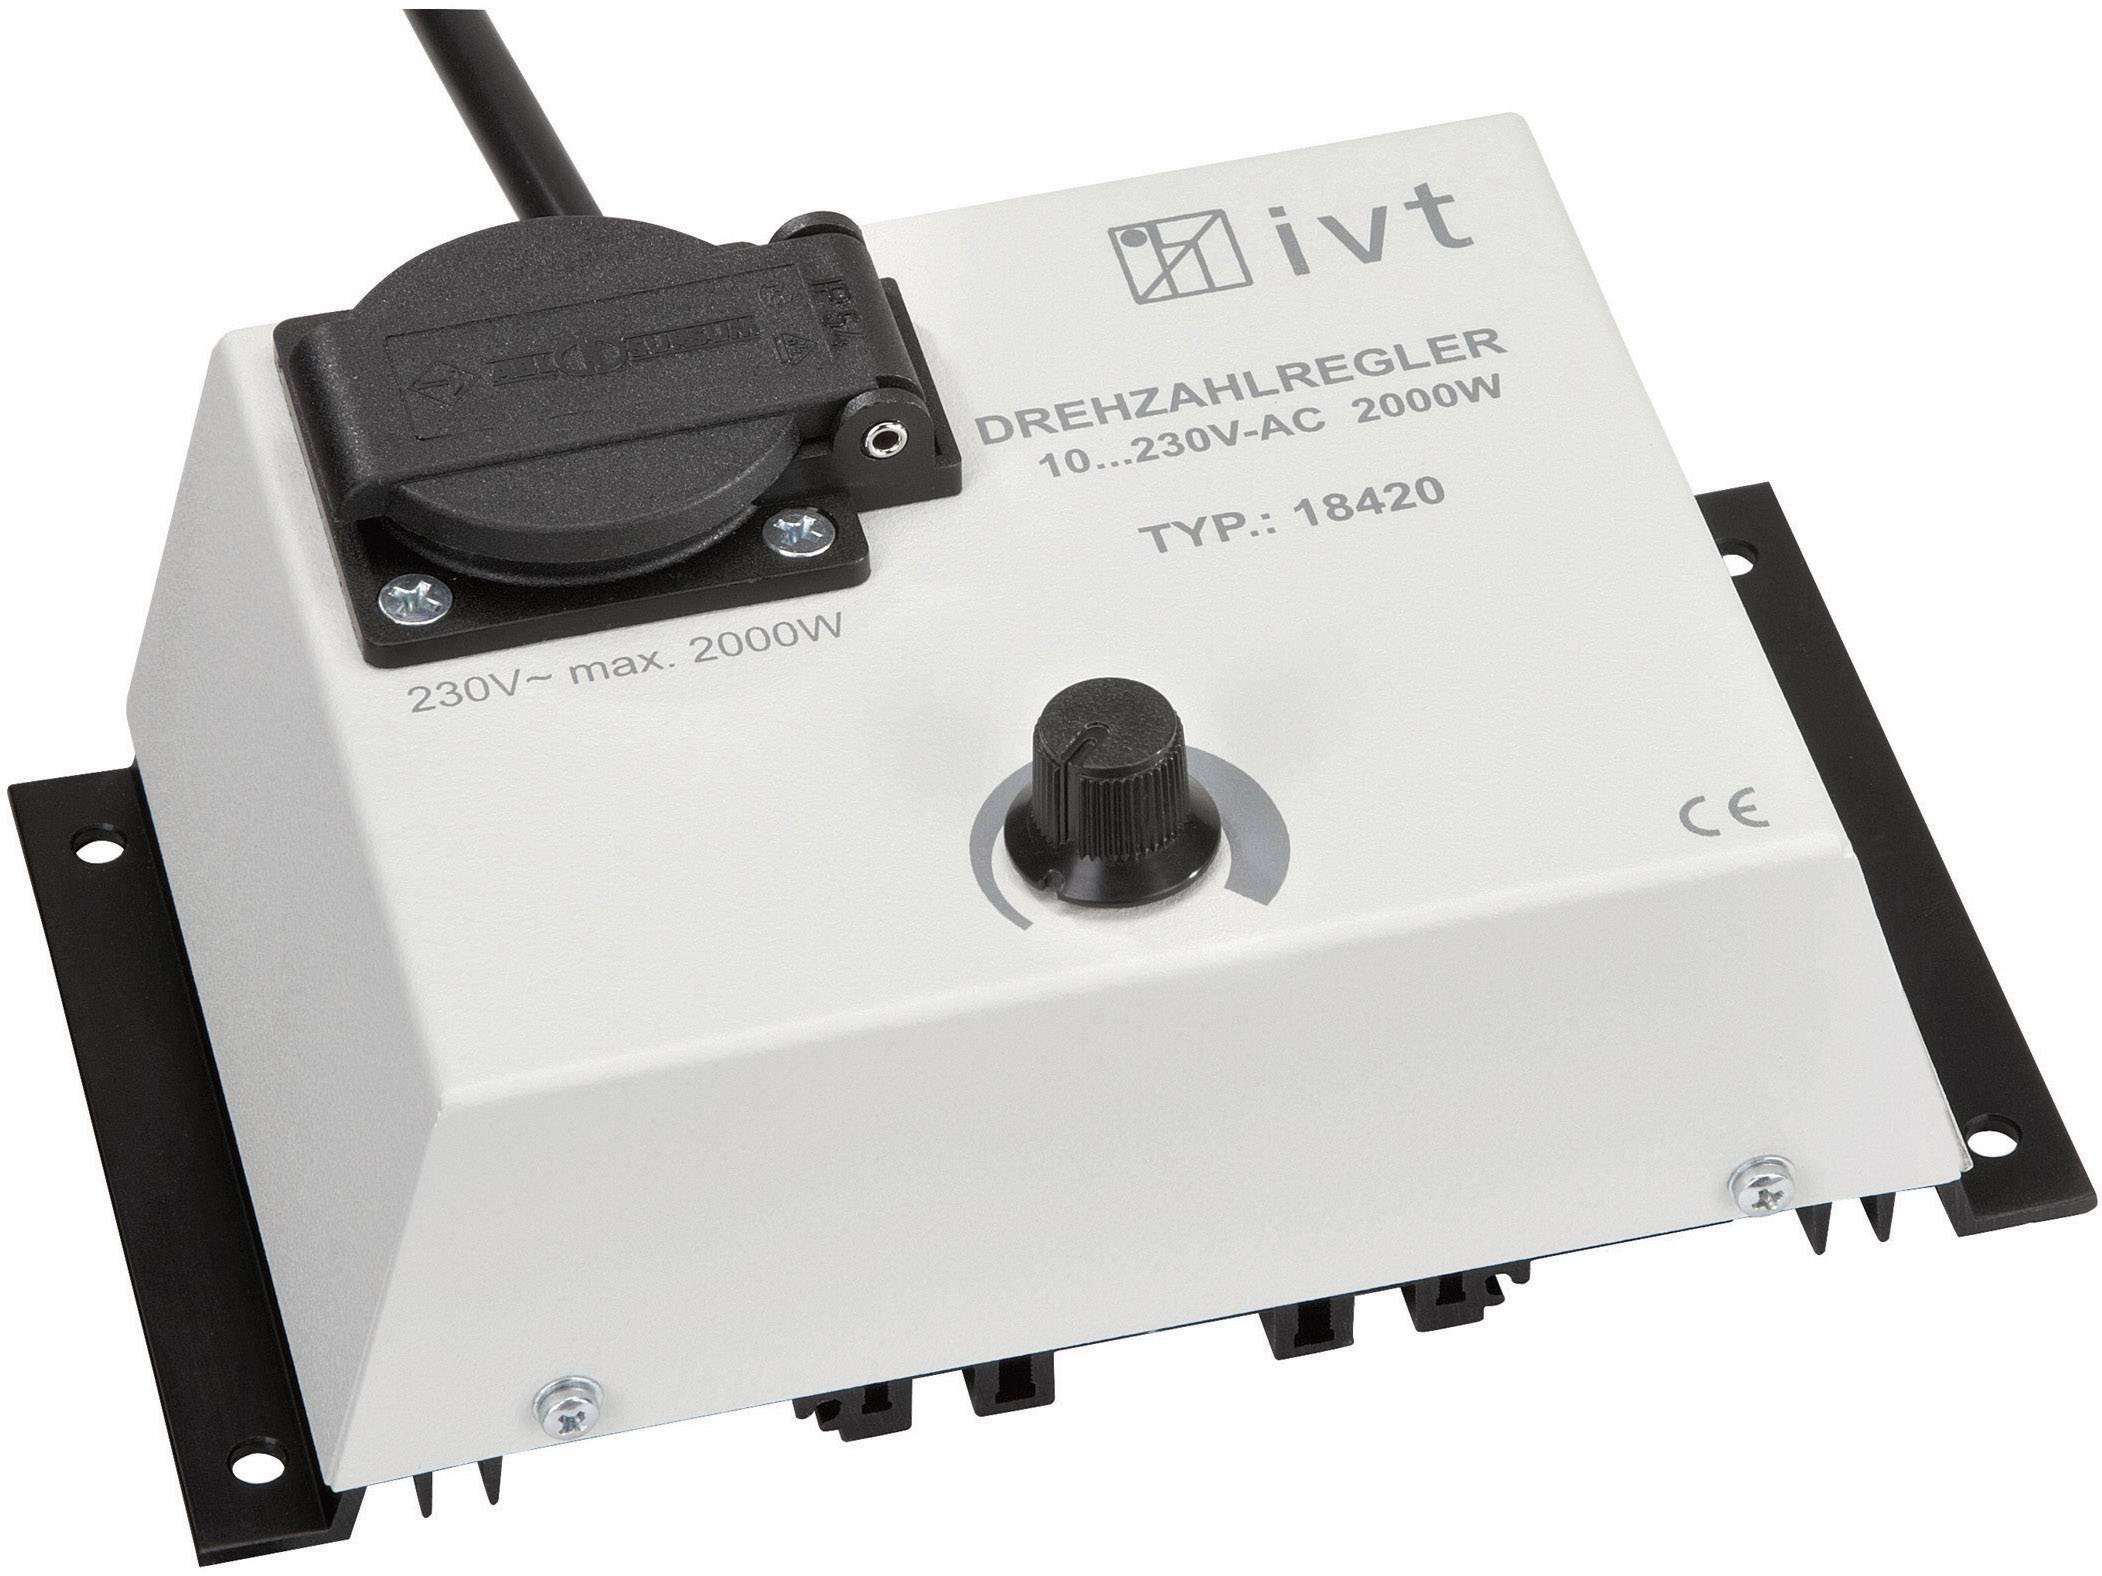 Regulátor napětí IVT DR-2000, 700100, 2000 W, 10 - 230 V/AC